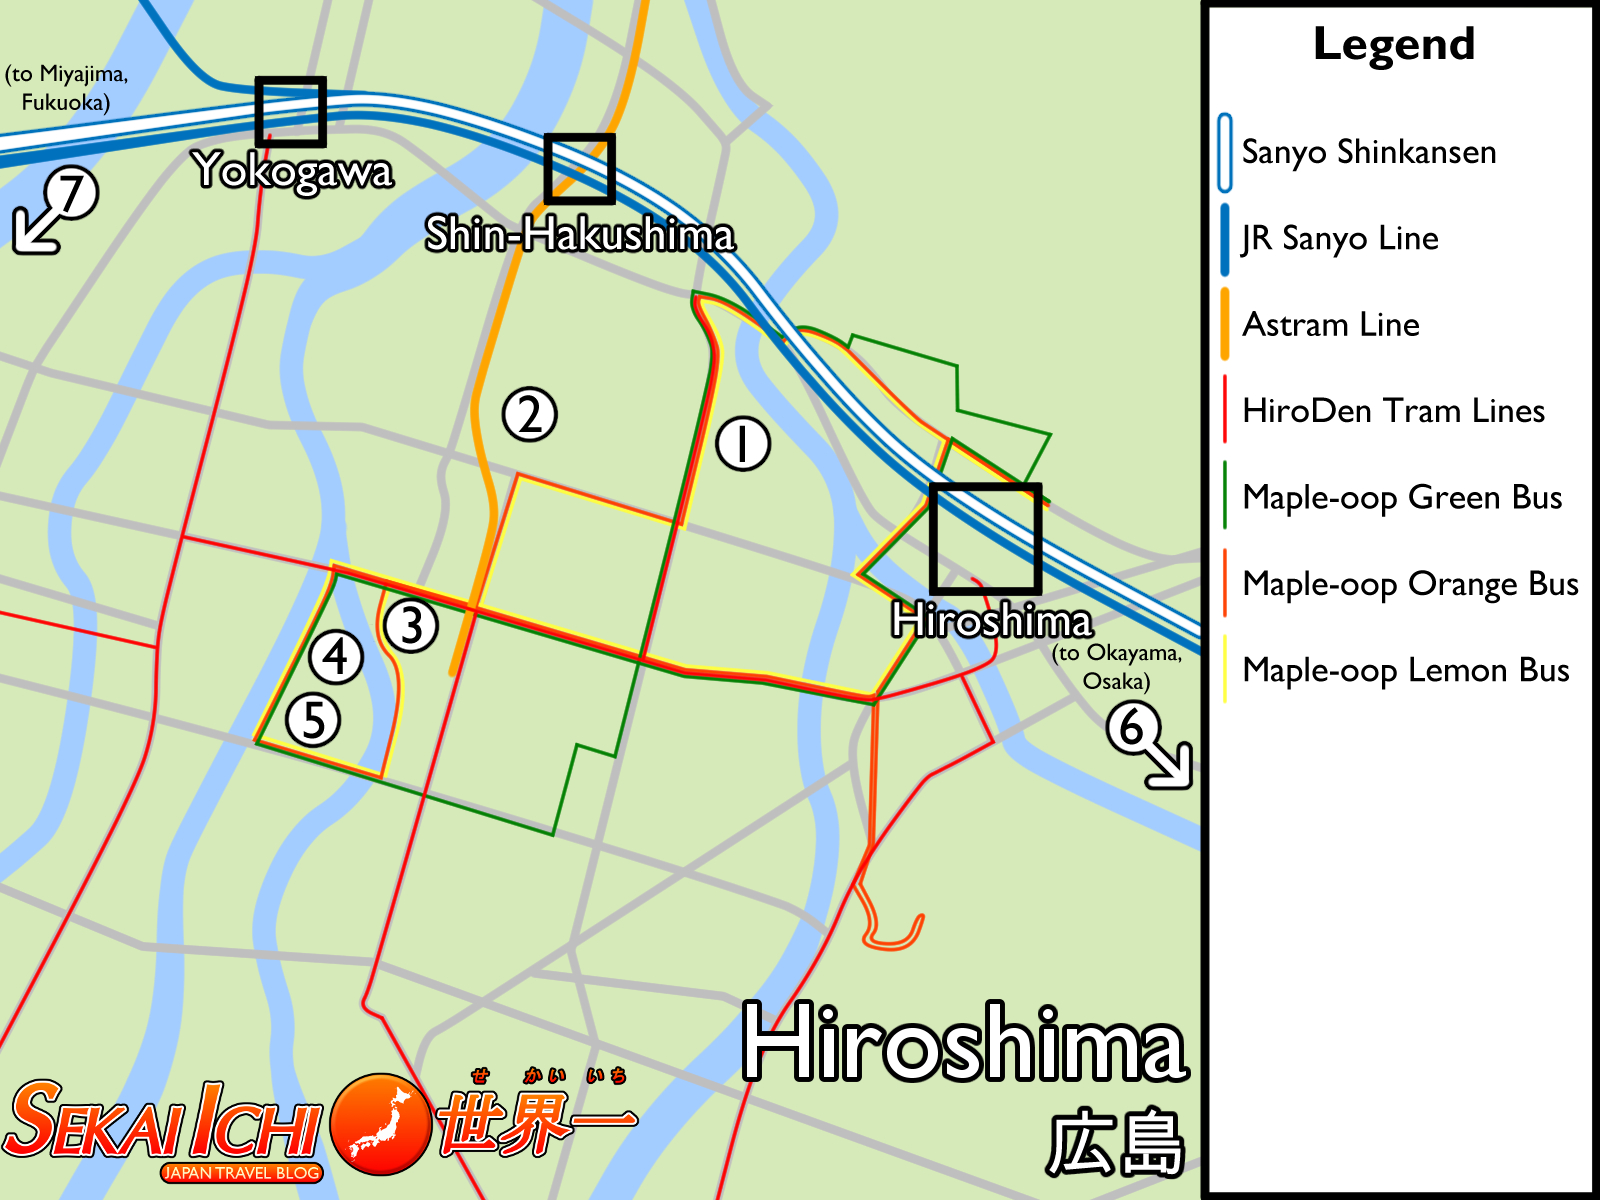 Sekai Ichi Japan Travel Blog Introduction to Hiroshima